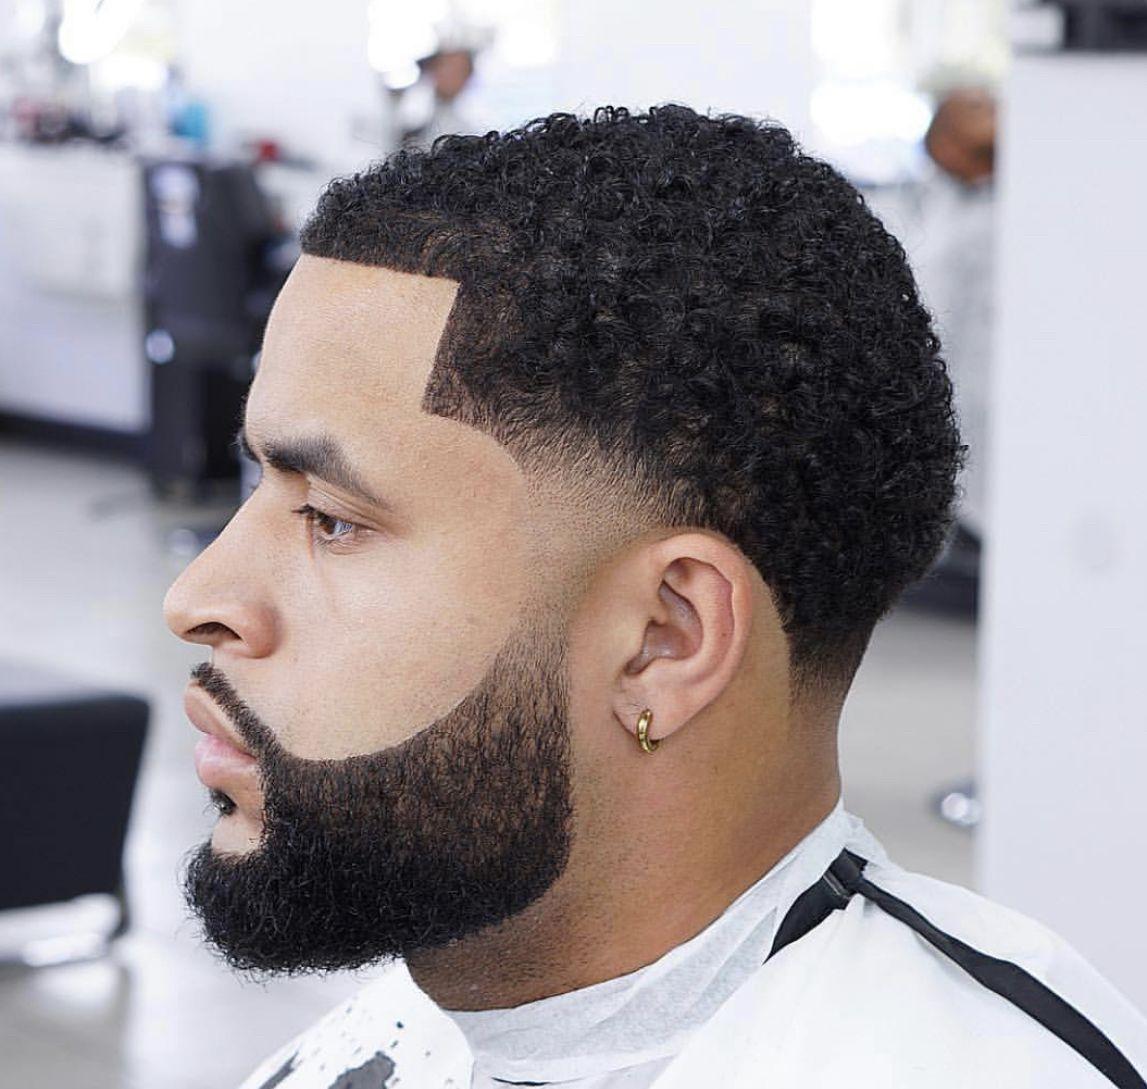 22 Modern Taper Fade Haircuts For Men 2020 Update In 2020 Taper Fade Haircut Blowout Haircut Fade Haircut